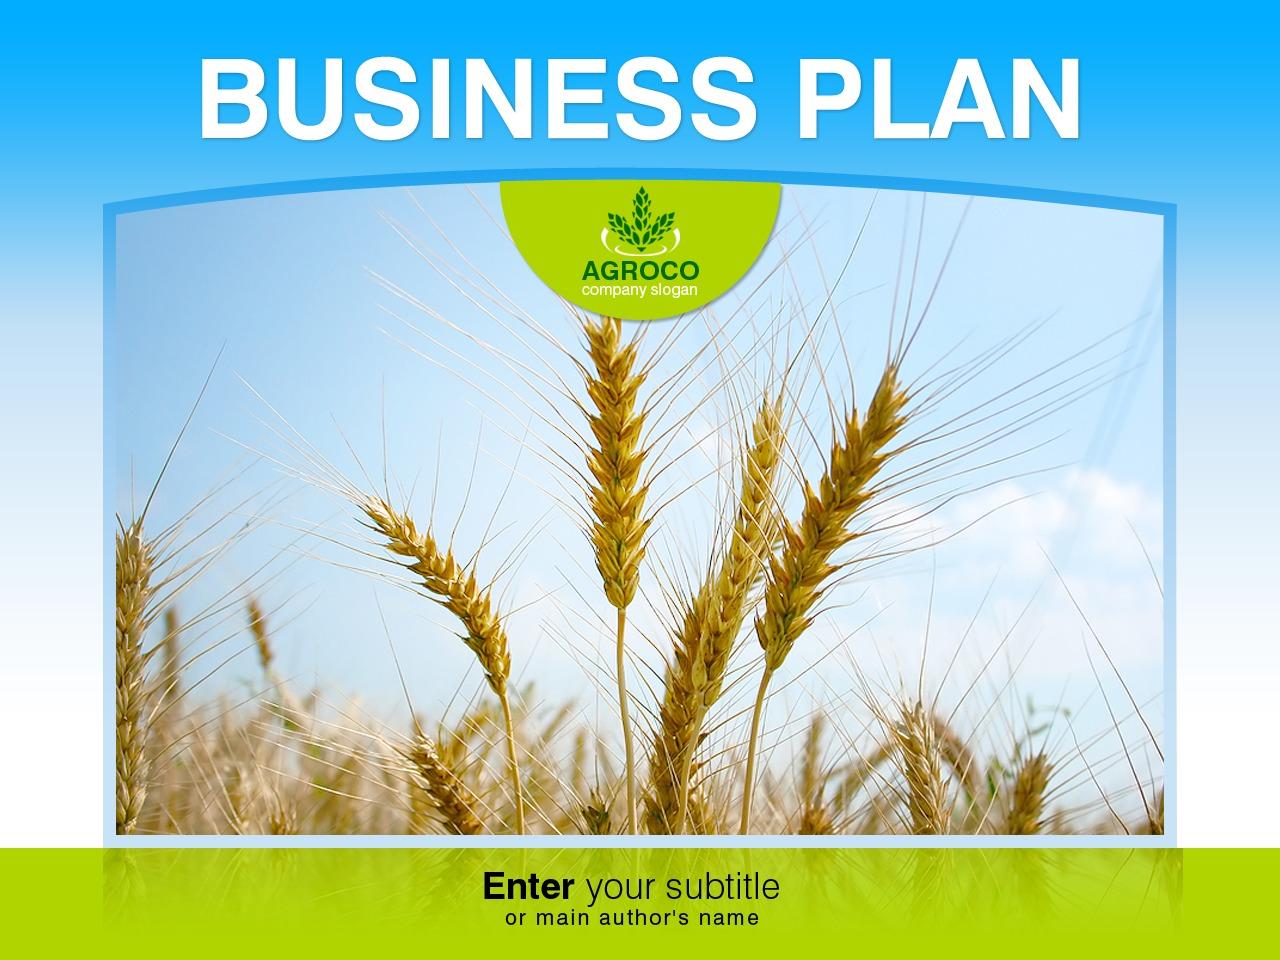 Szablon PowerPoint #32293 na temat: rolnictwo